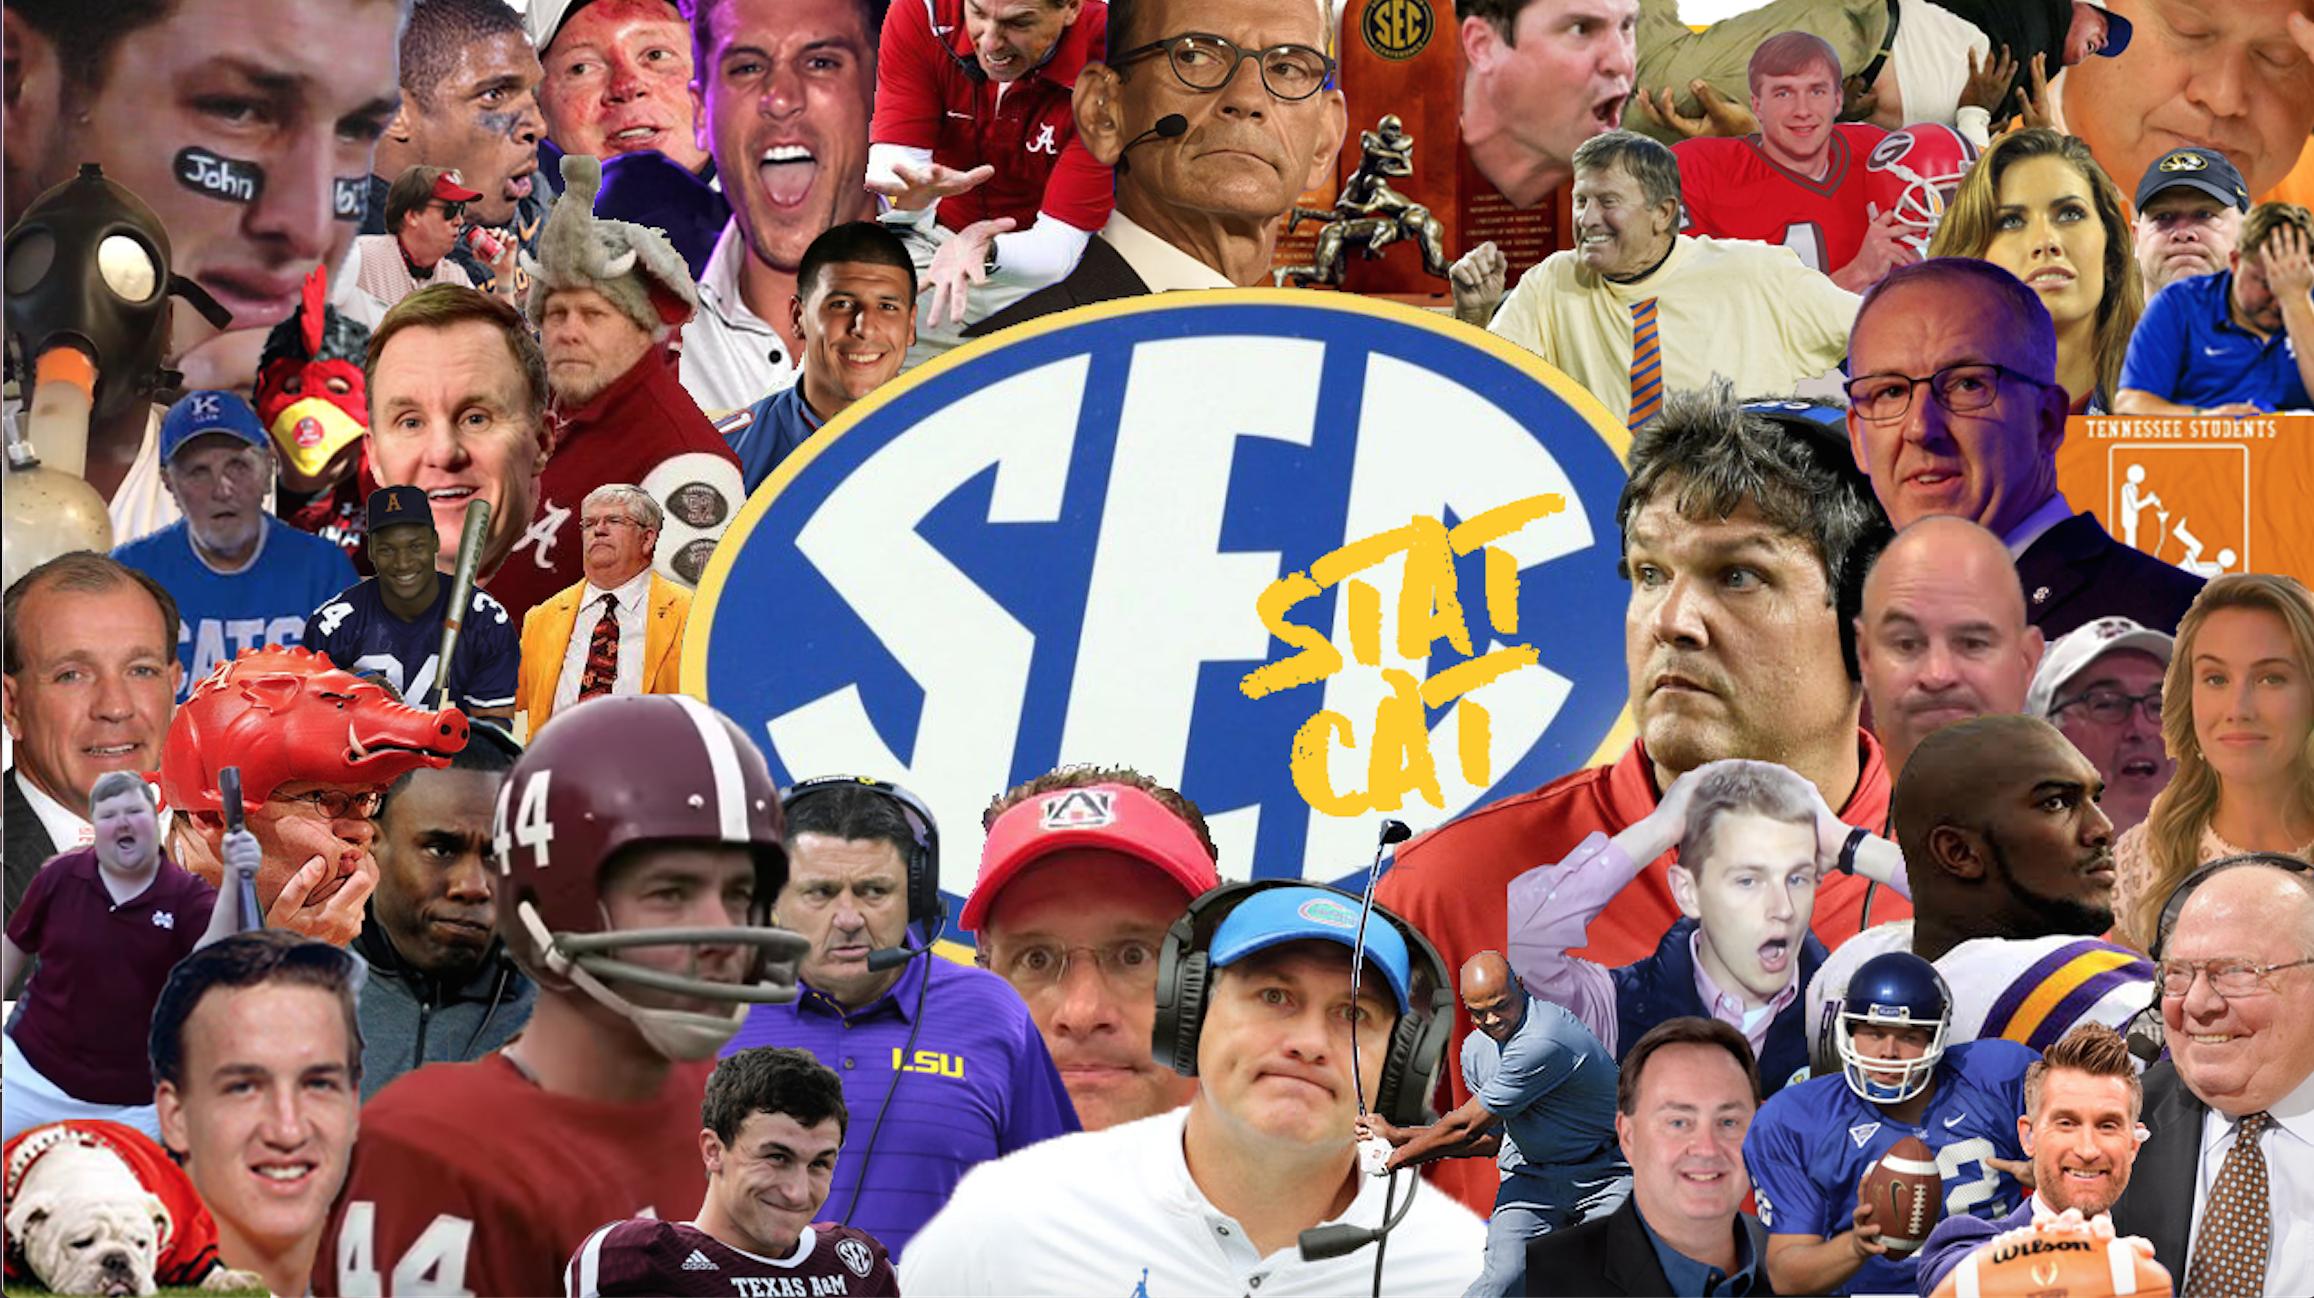 2019 SEC Statcast: Arkansas Under/Over